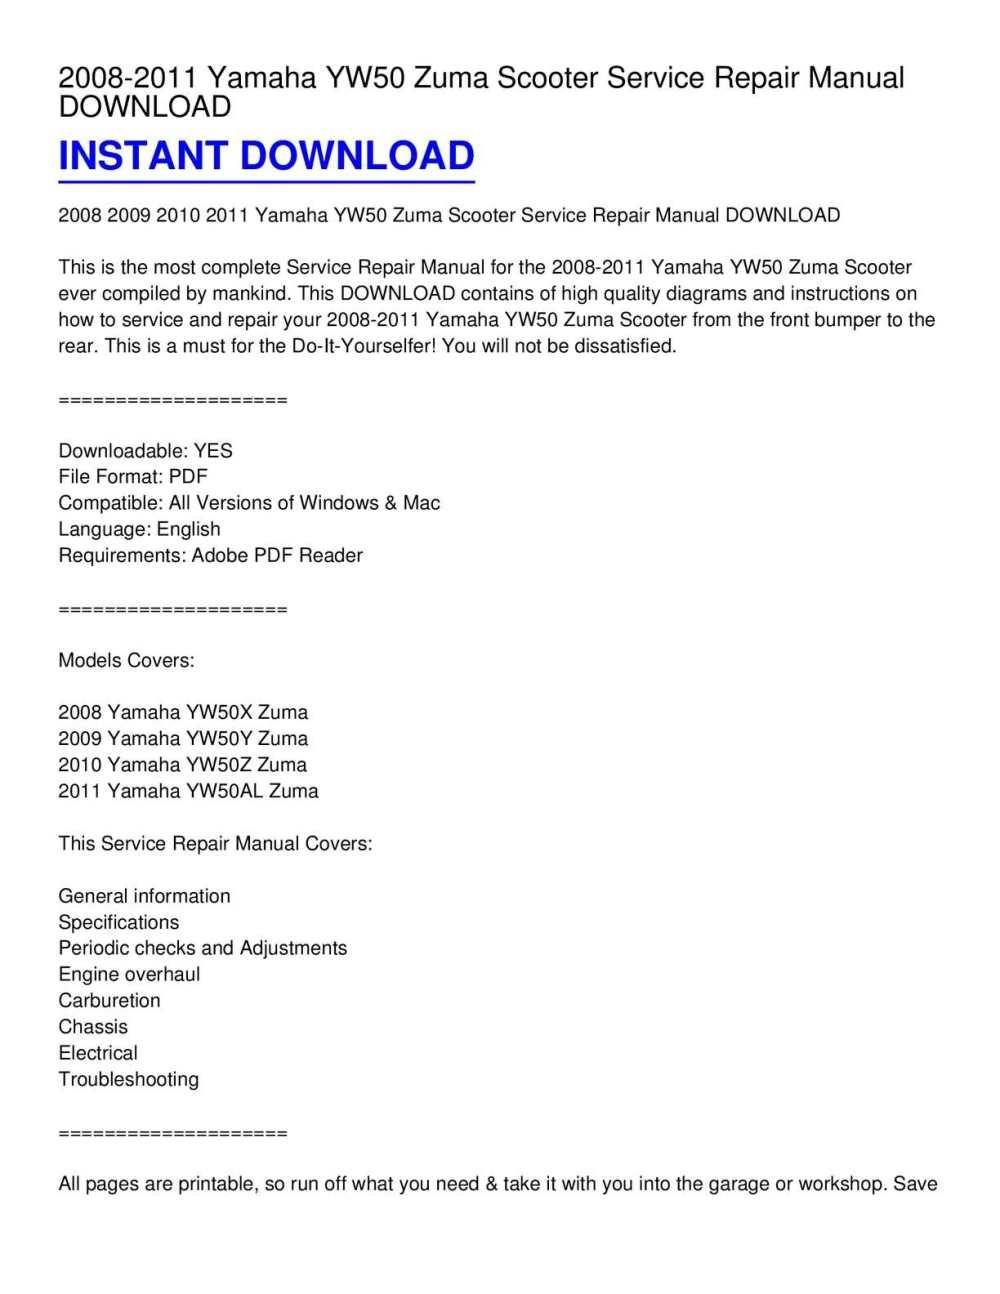 medium resolution of calam o 2008 2011 yamaha yw50 zuma scooter service repair manual download